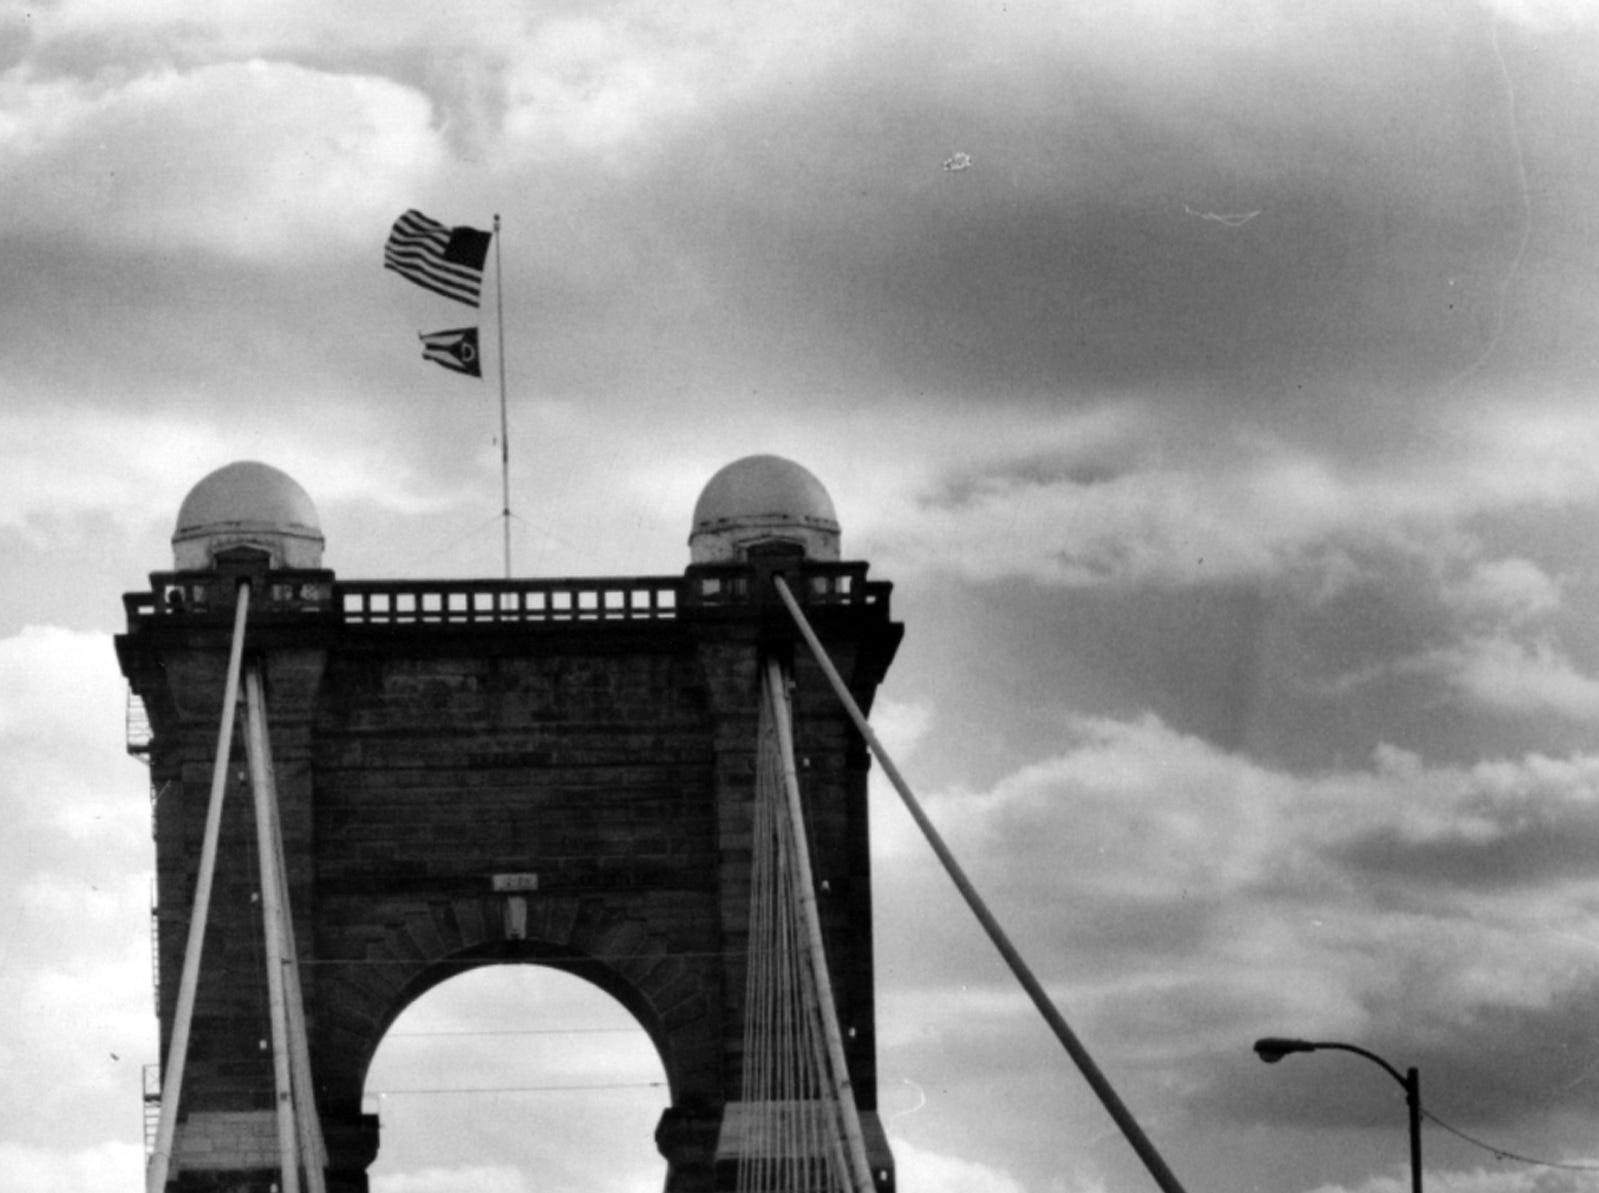 OCTOBER 24, 1988: John A. Roebling Suspension Bridge. The Enquirer/Michael Snyder scanned May 16, 2013